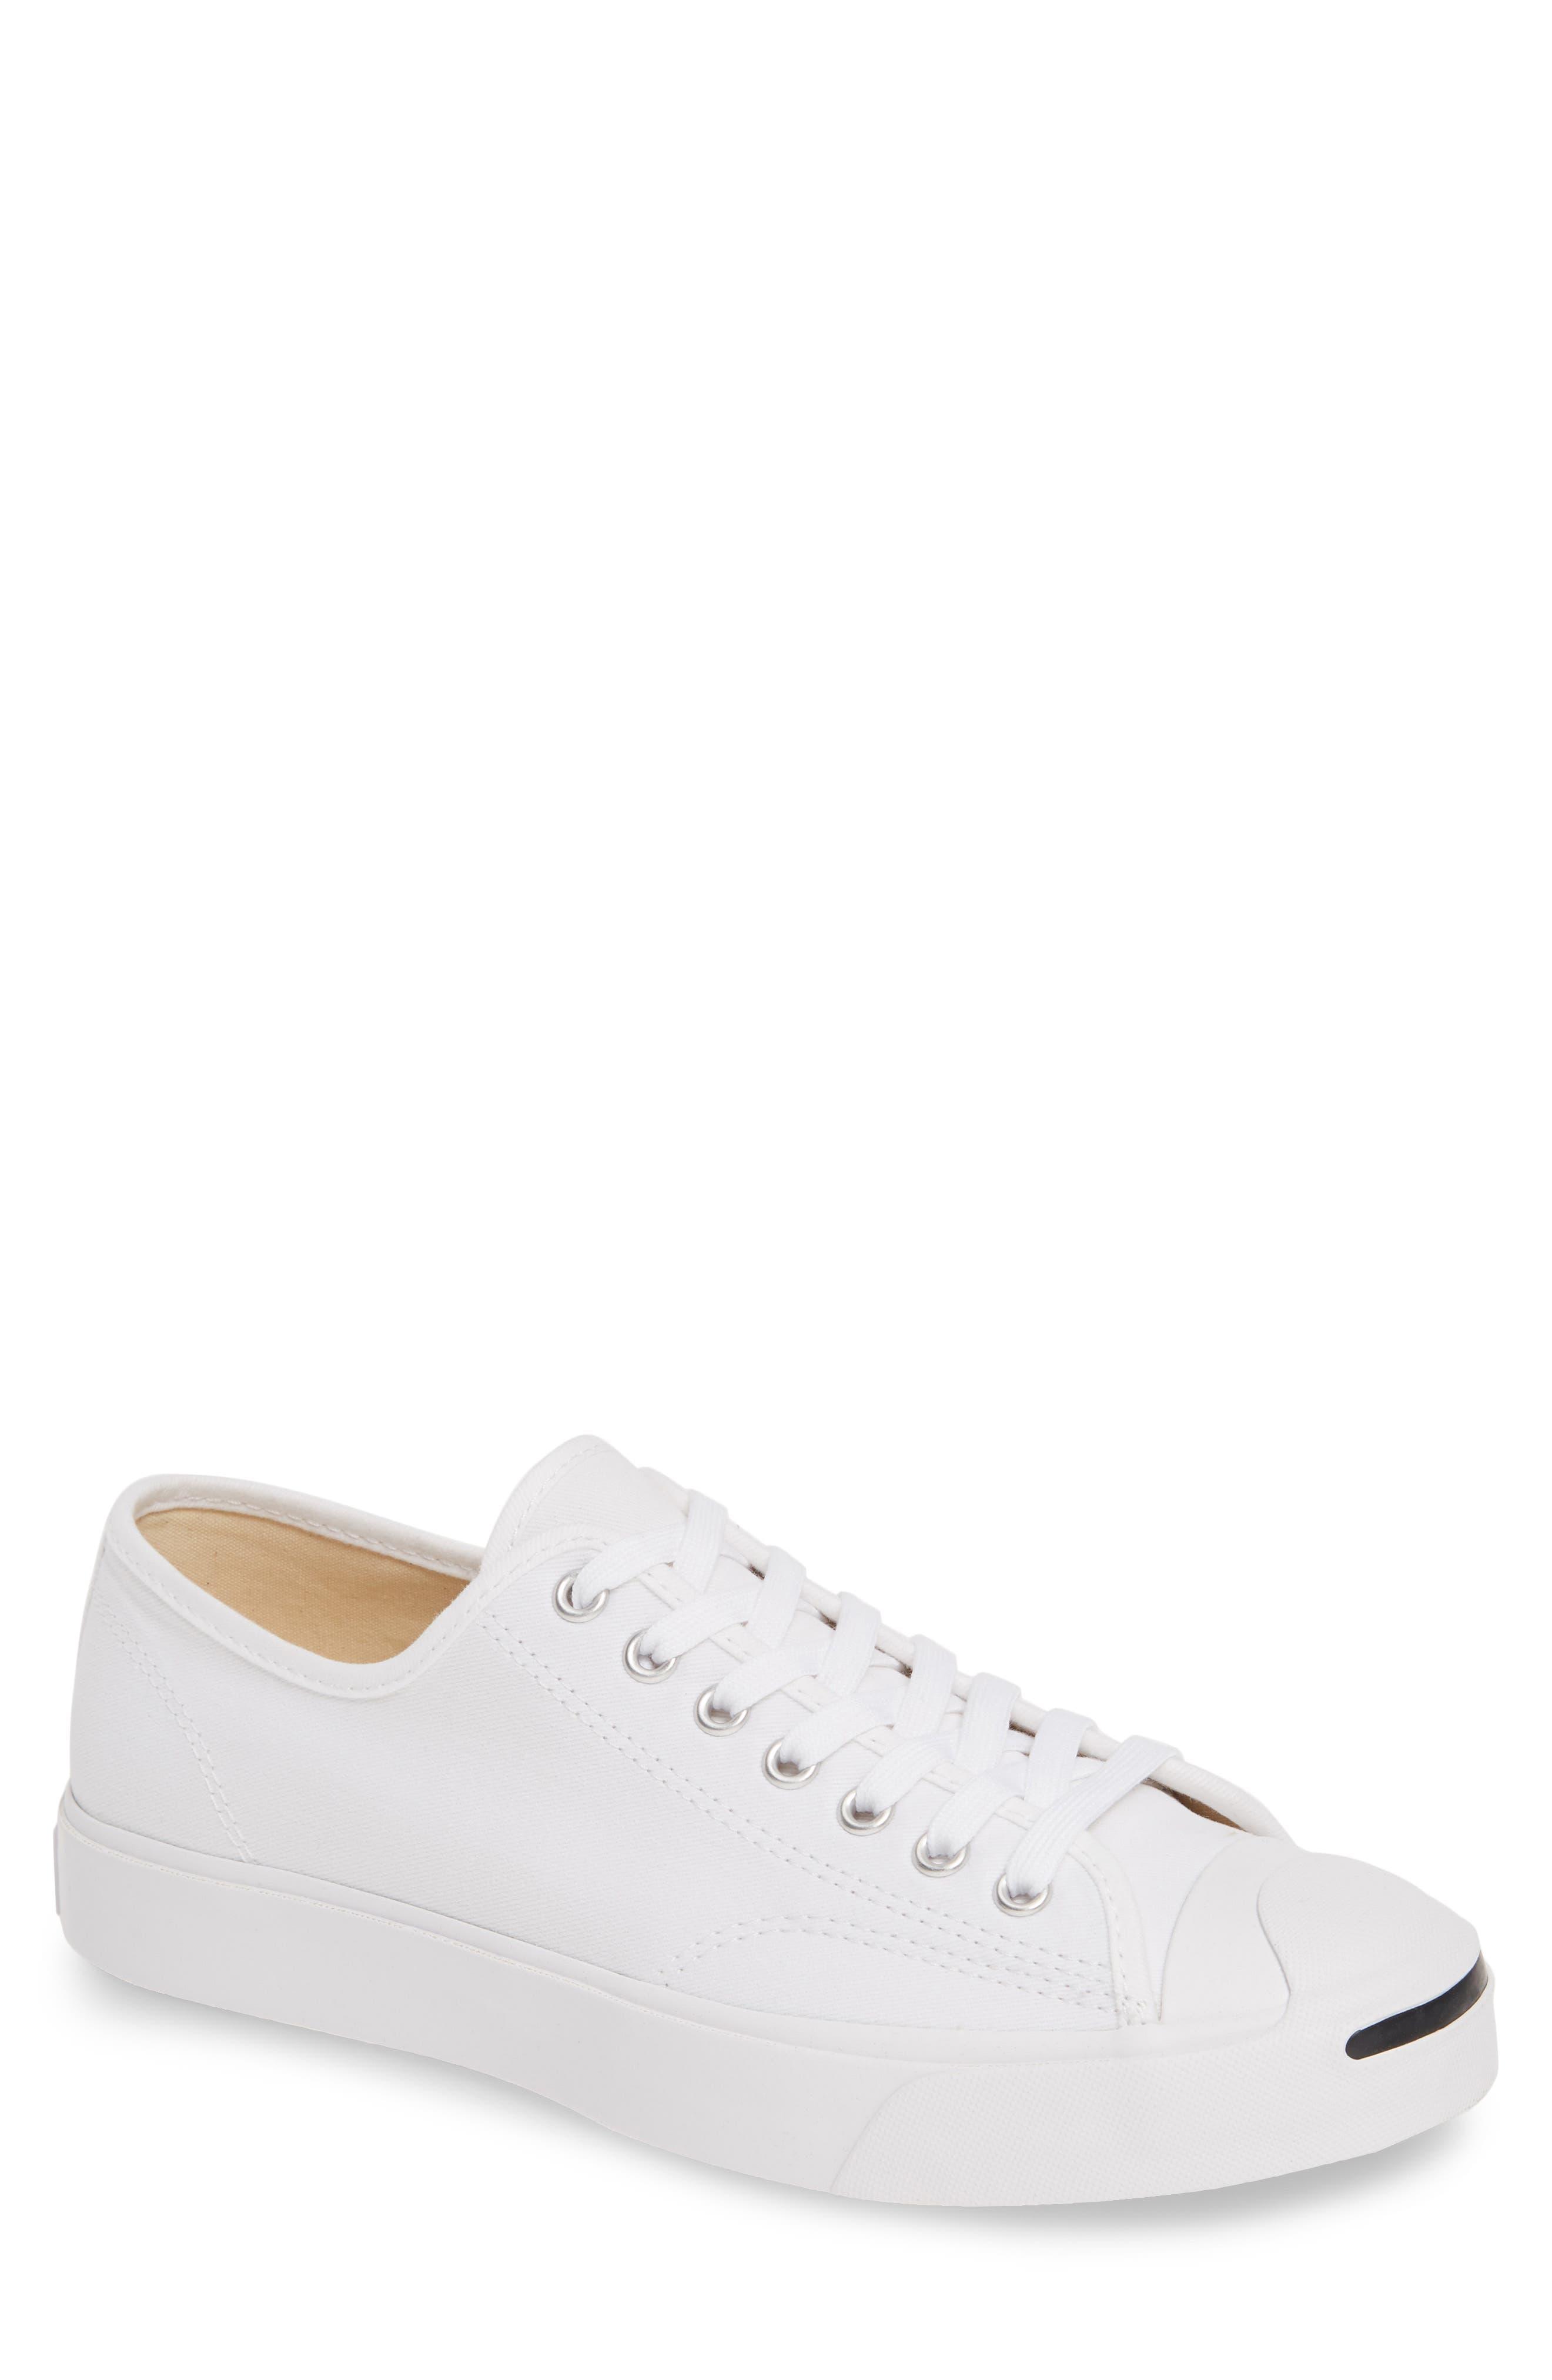 c5837d92ed8a Men s Sneakers